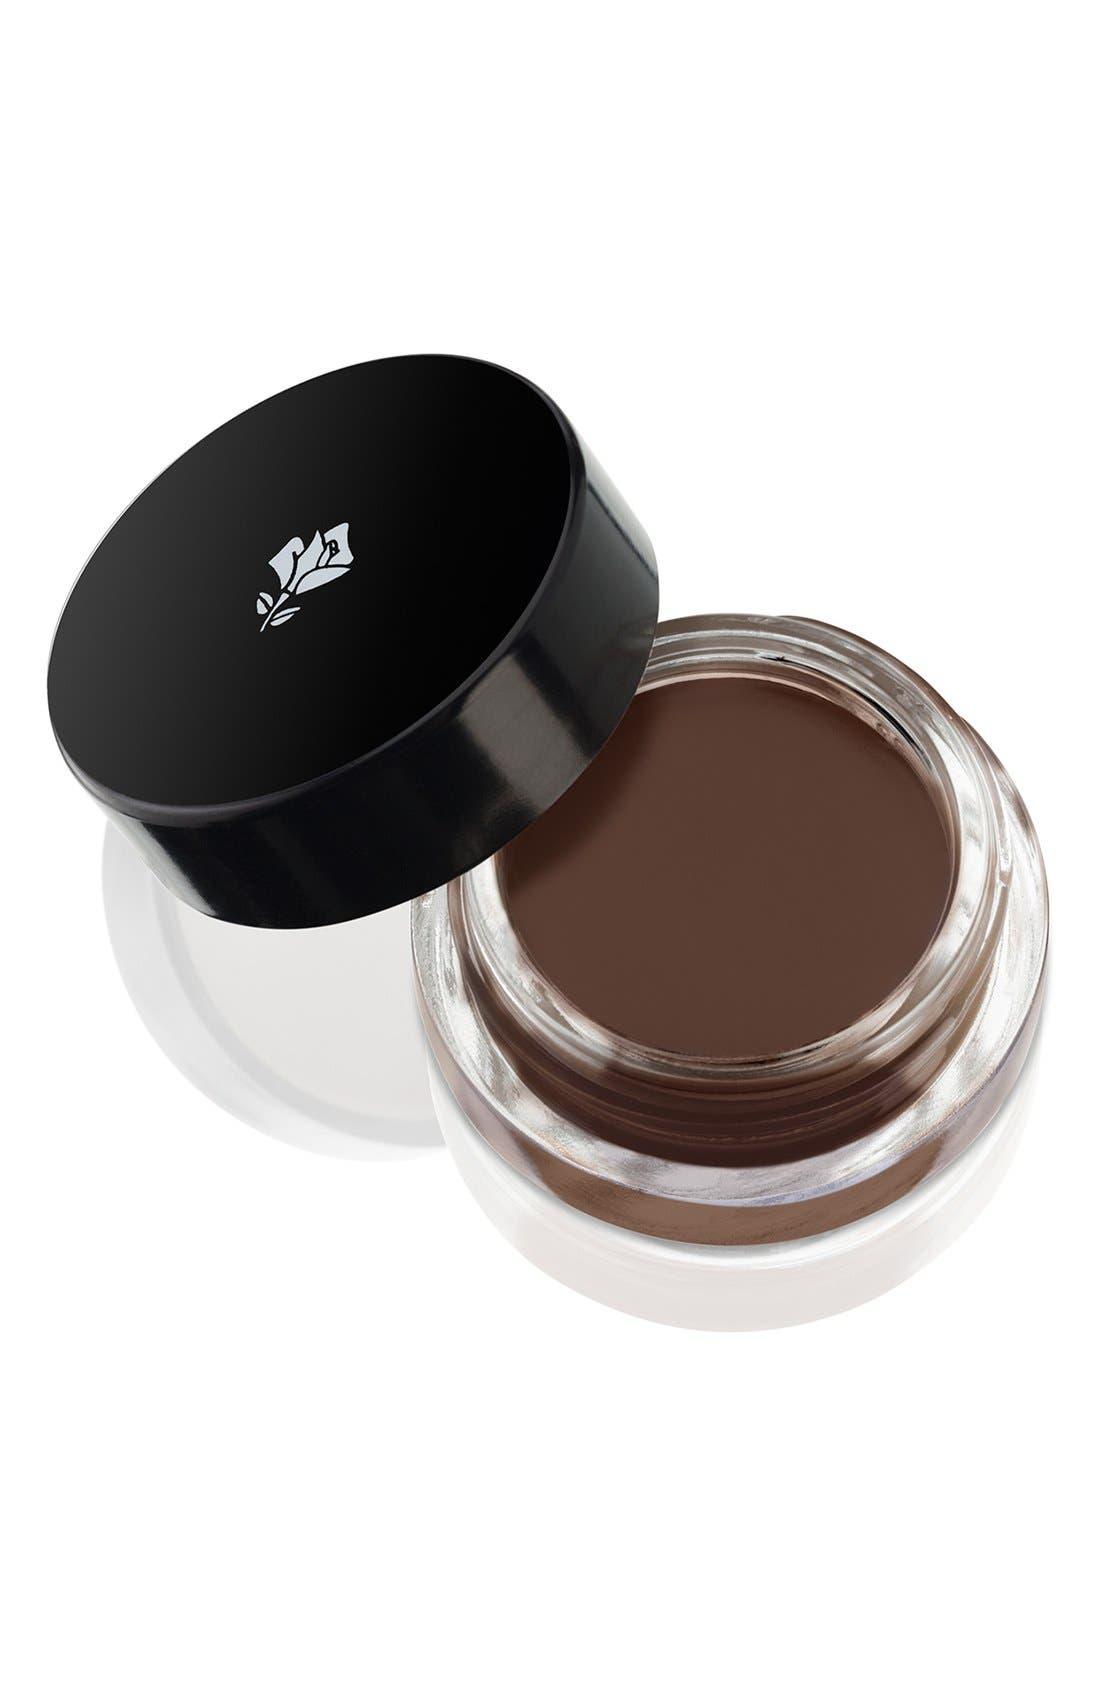 Sourcils Waterproof Eyebrow Gel-Cream,                         Main,                         color, 03 TAUPE